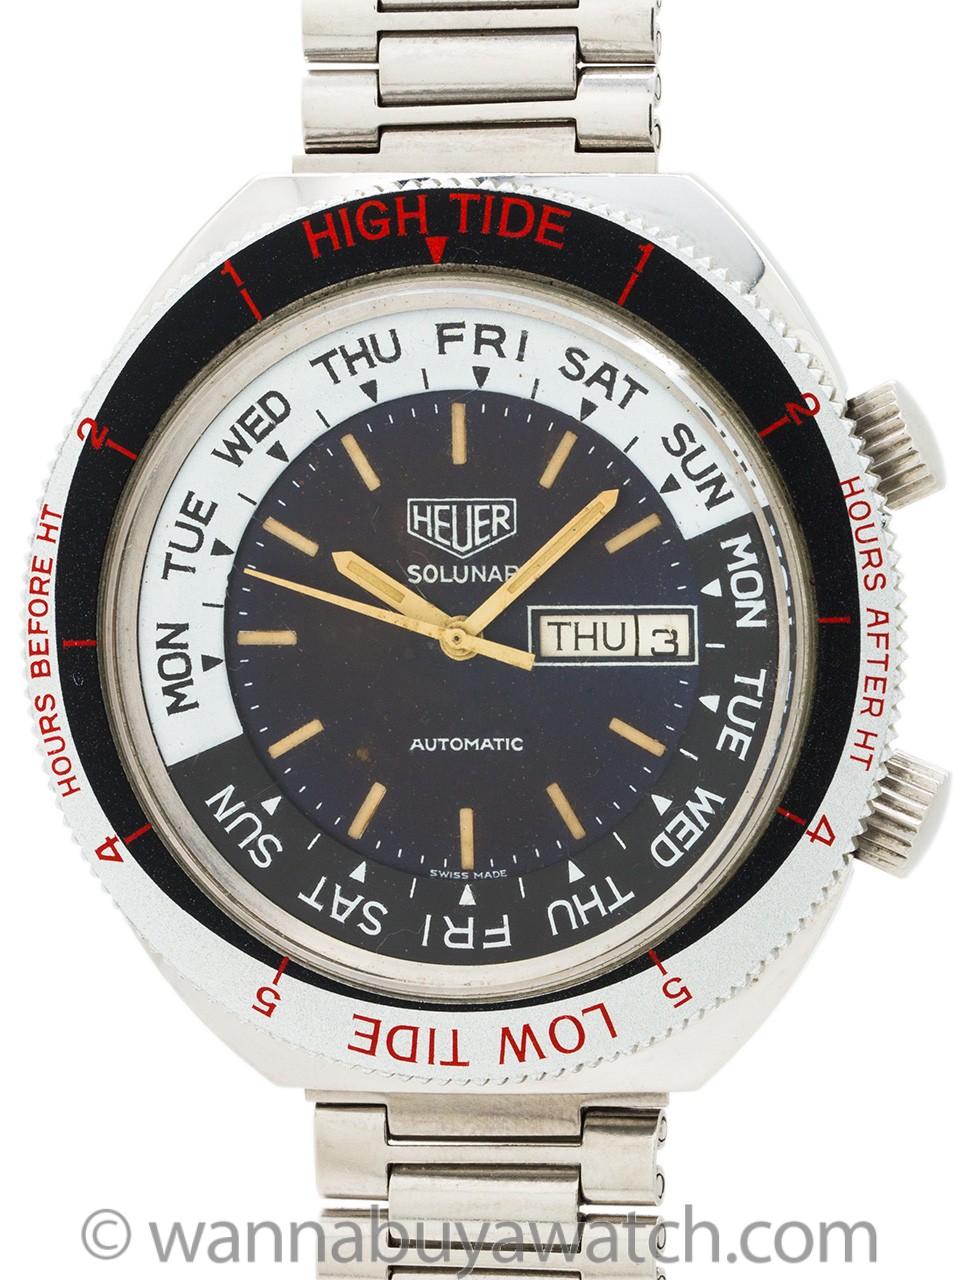 "Heuer Solunar ref 279.603 Hi Tide Low Tide circa 1976 ""Globetrotter Memorobilia"""